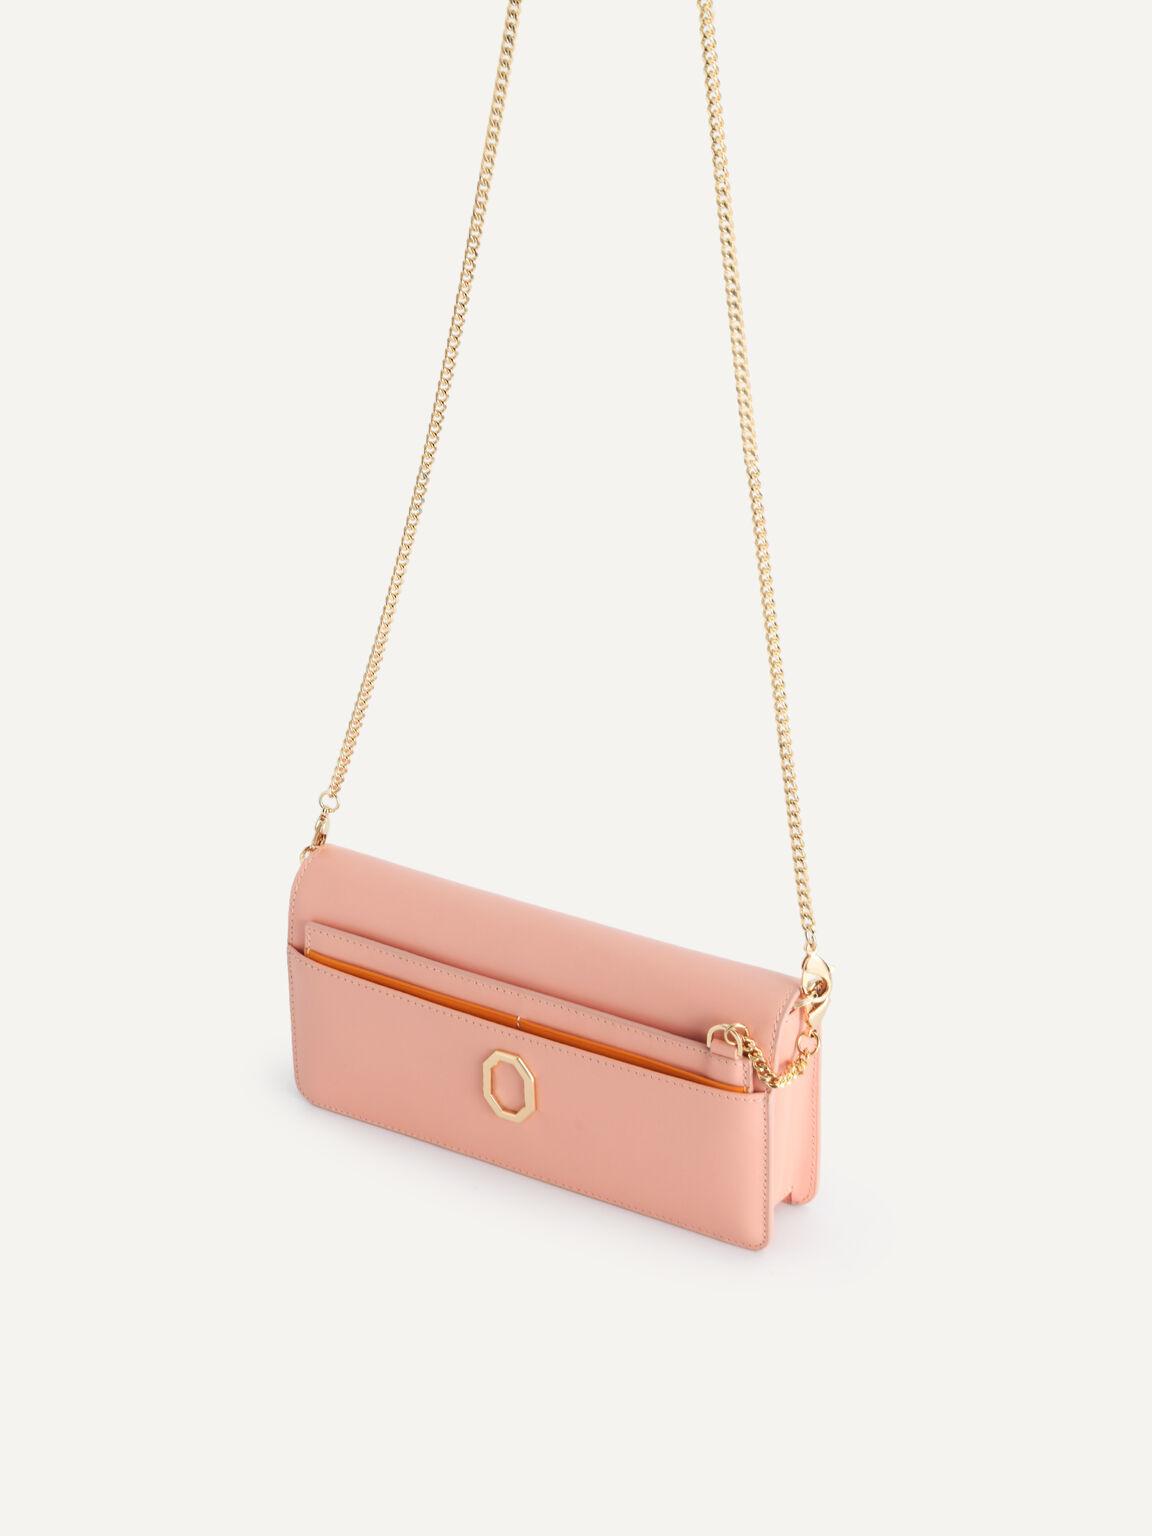 Long Leather Wallet, Blush, hi-res